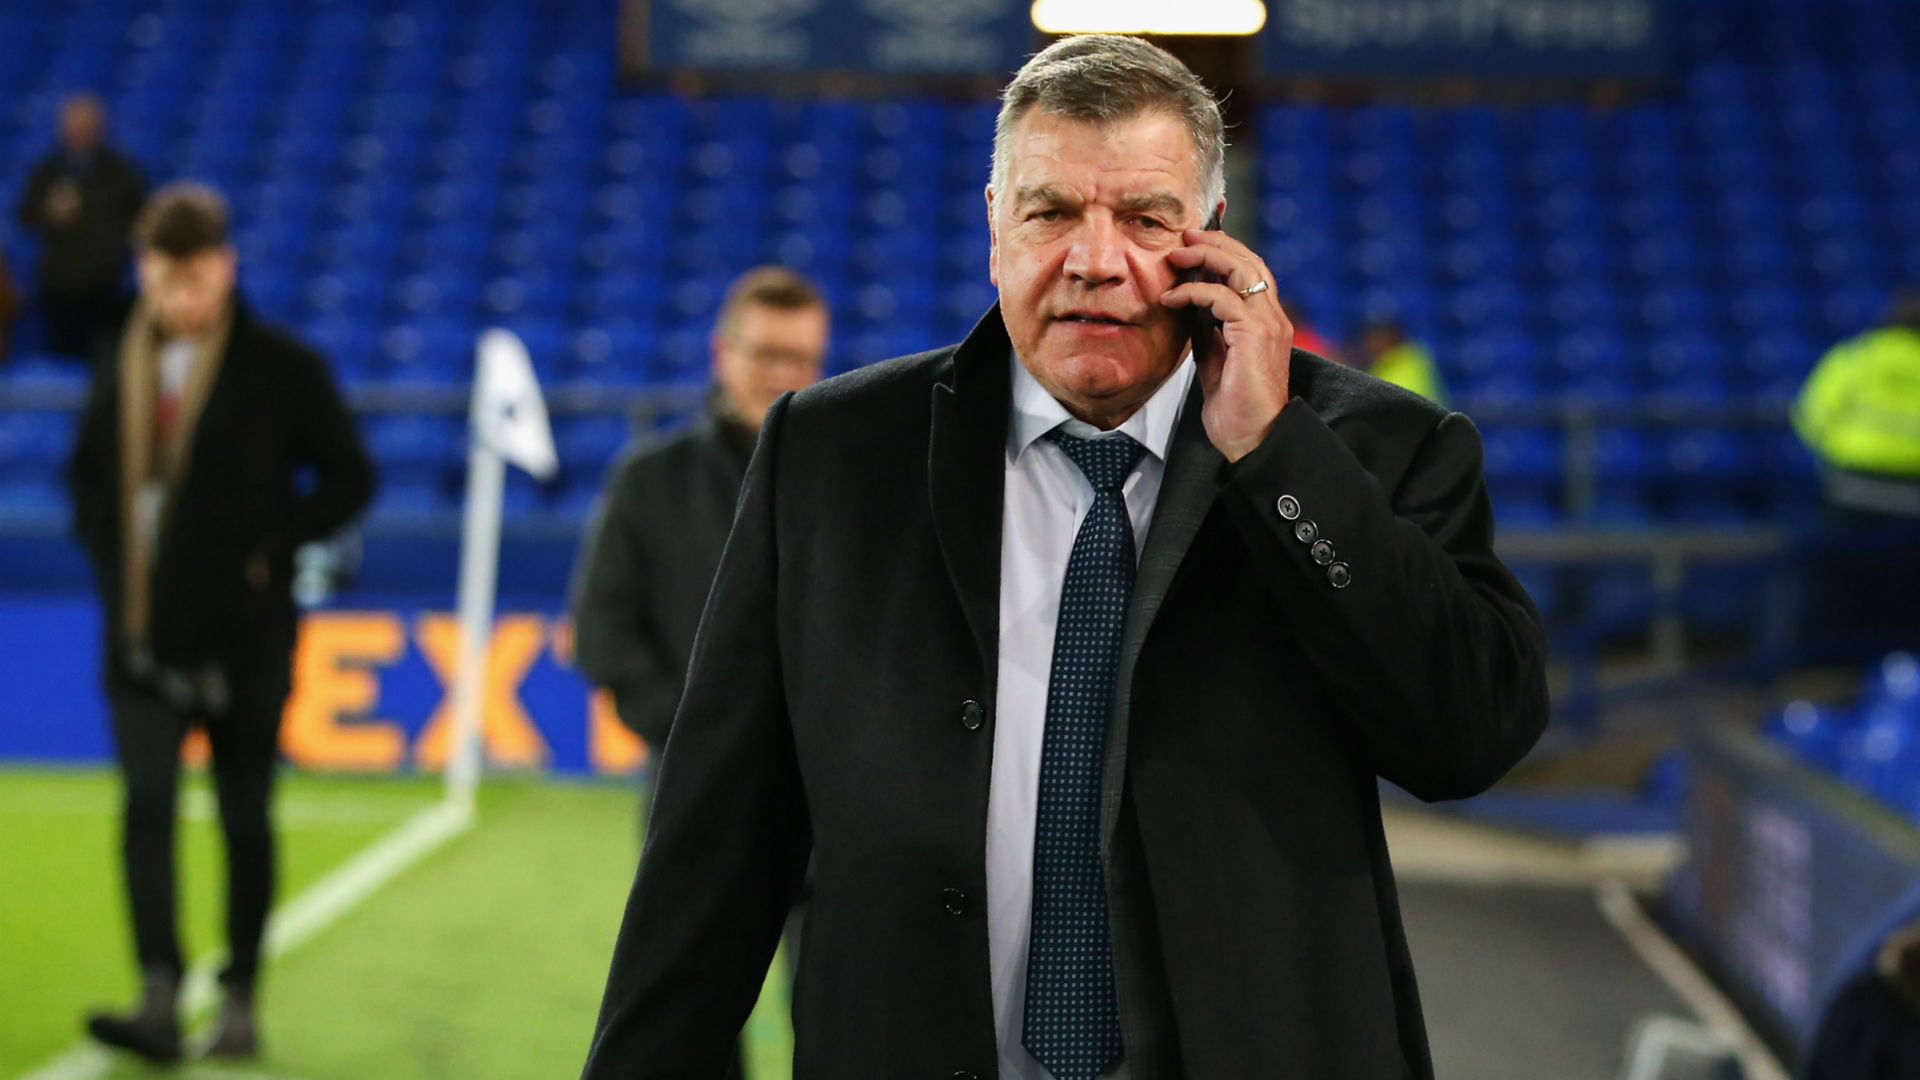 Sam Allardyce confirmed as Everton boss on 18-month deal